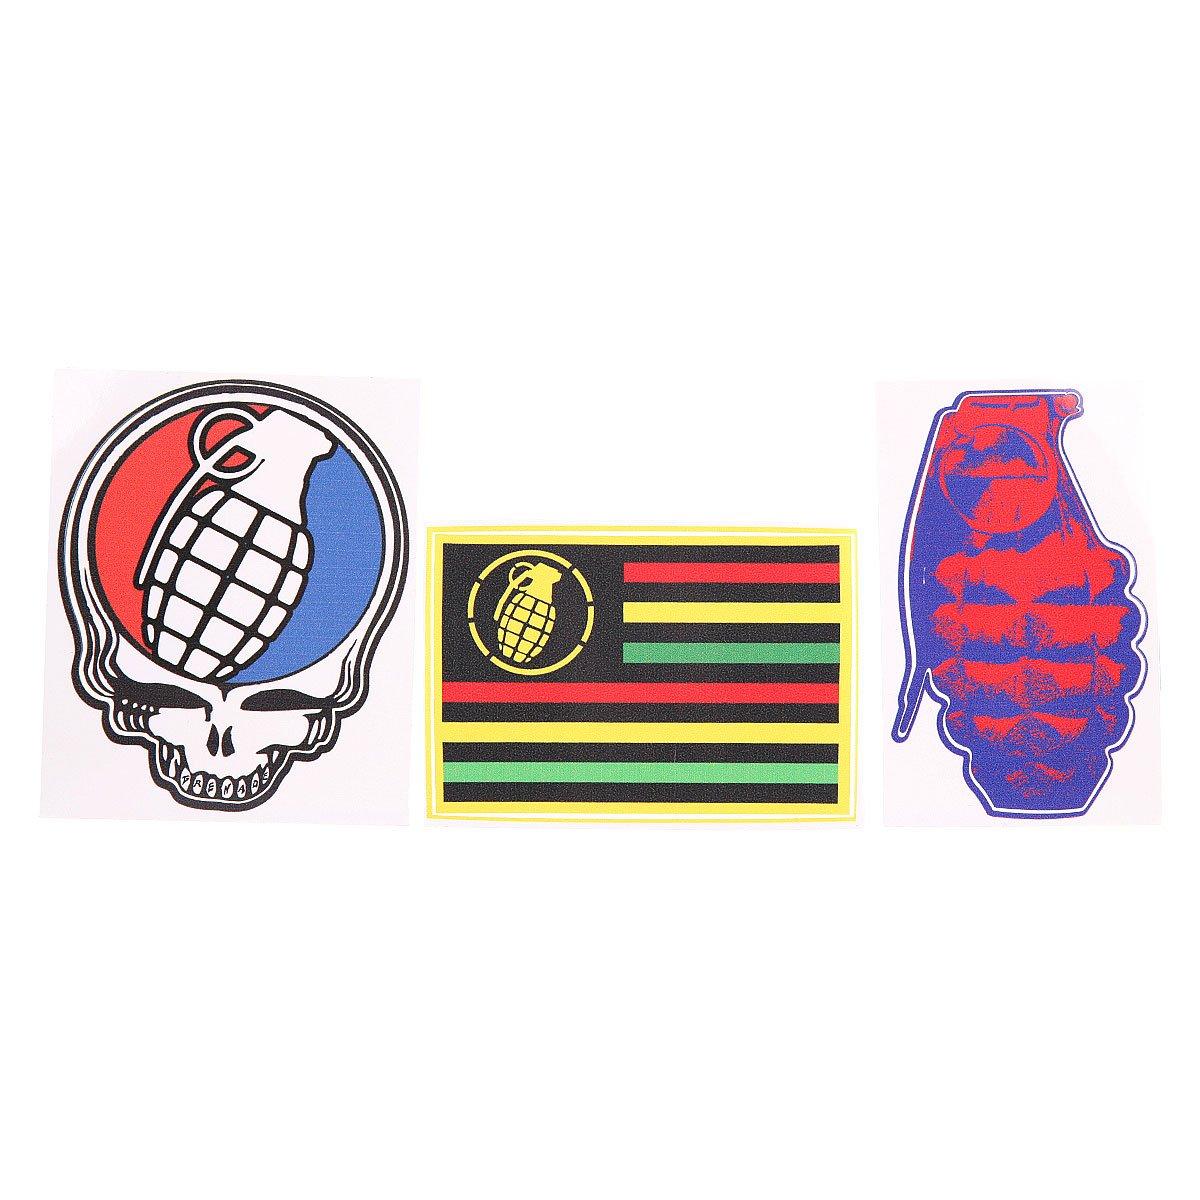 Наклейки Grenade Official Grenade Sticker Pack Multi Colour